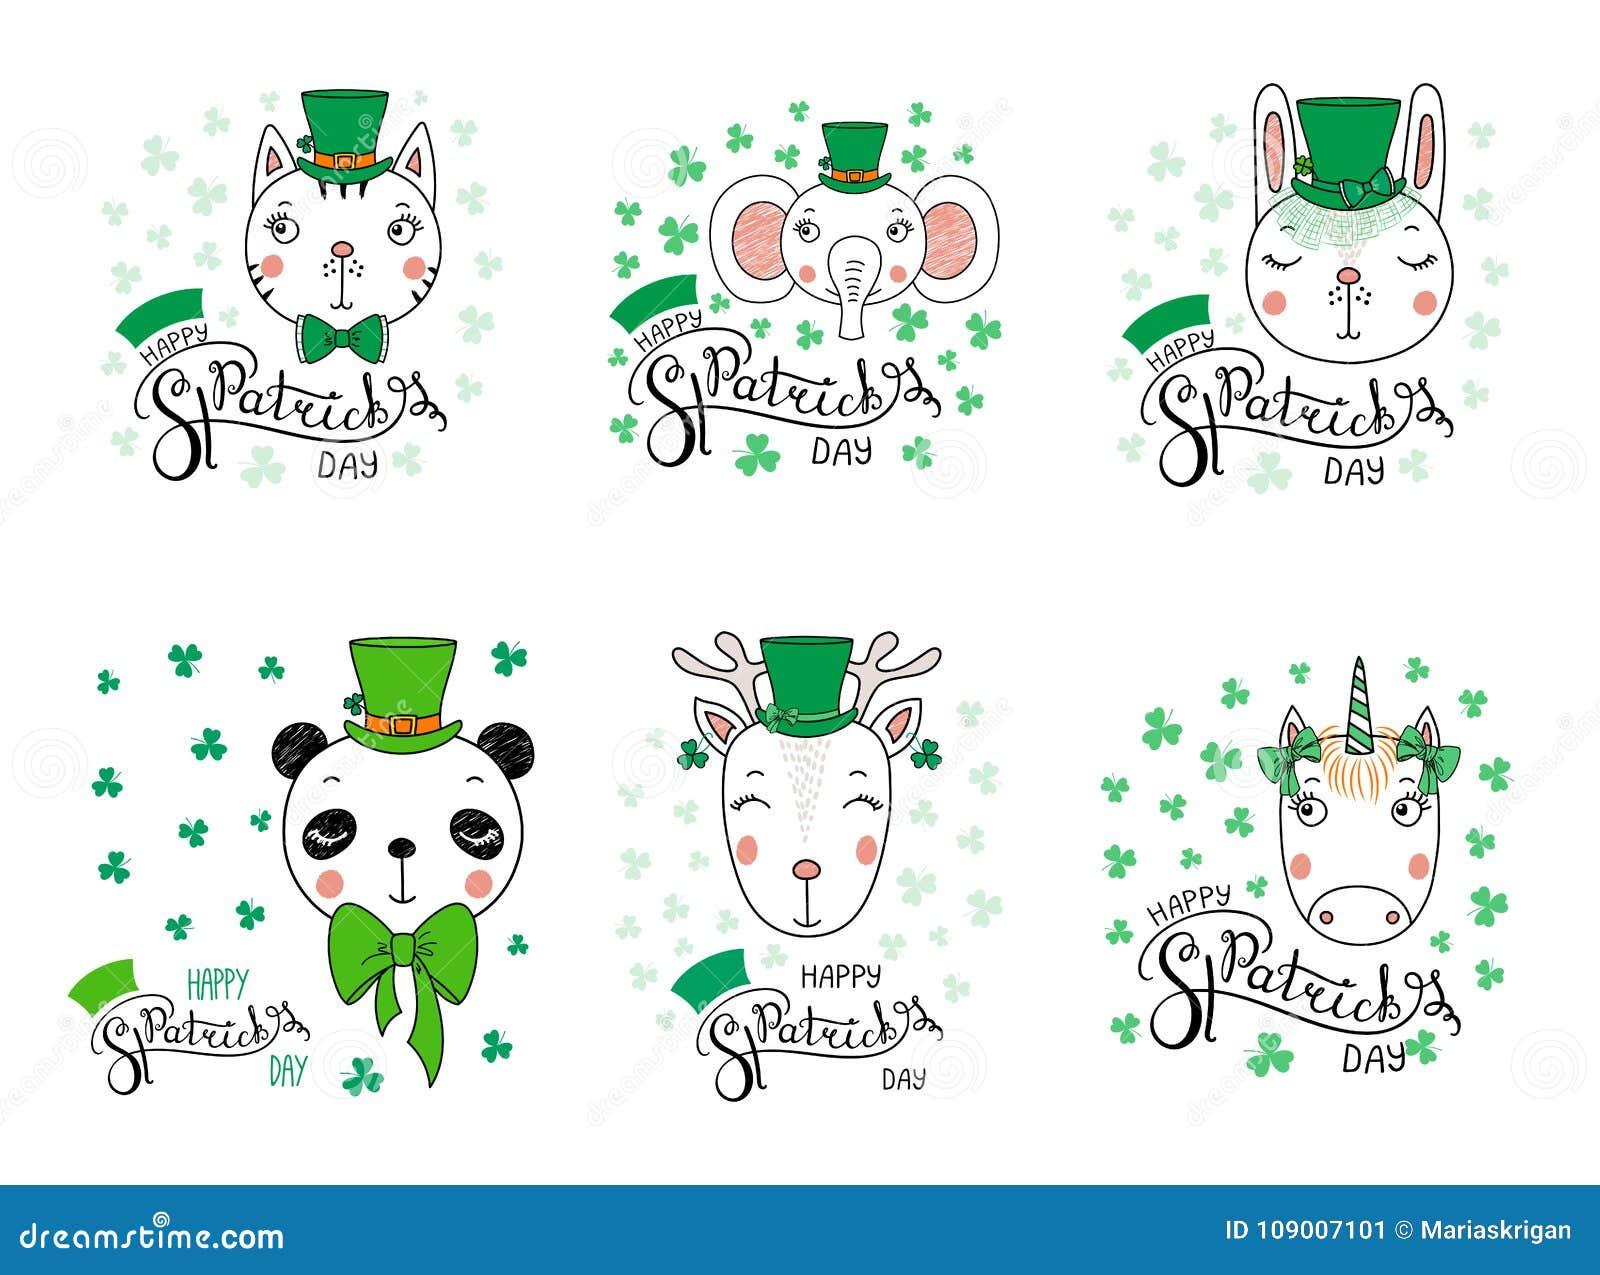 Cute Animals In Leprechaun Hats Stock Vector Illustration Of Hand